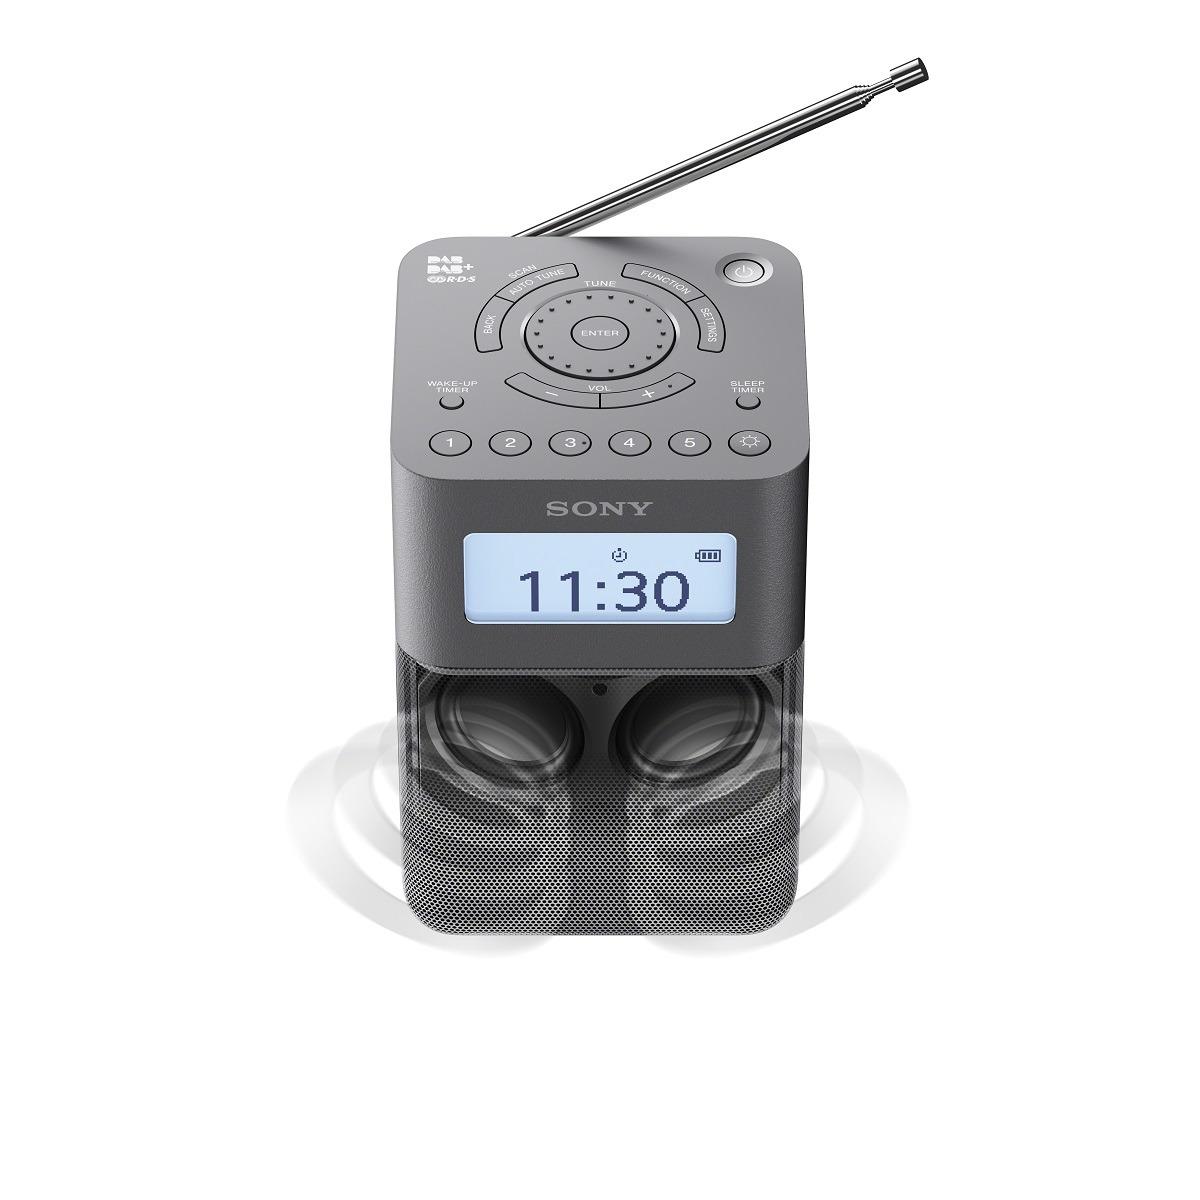 Korting Sony XDR V20D dab radio